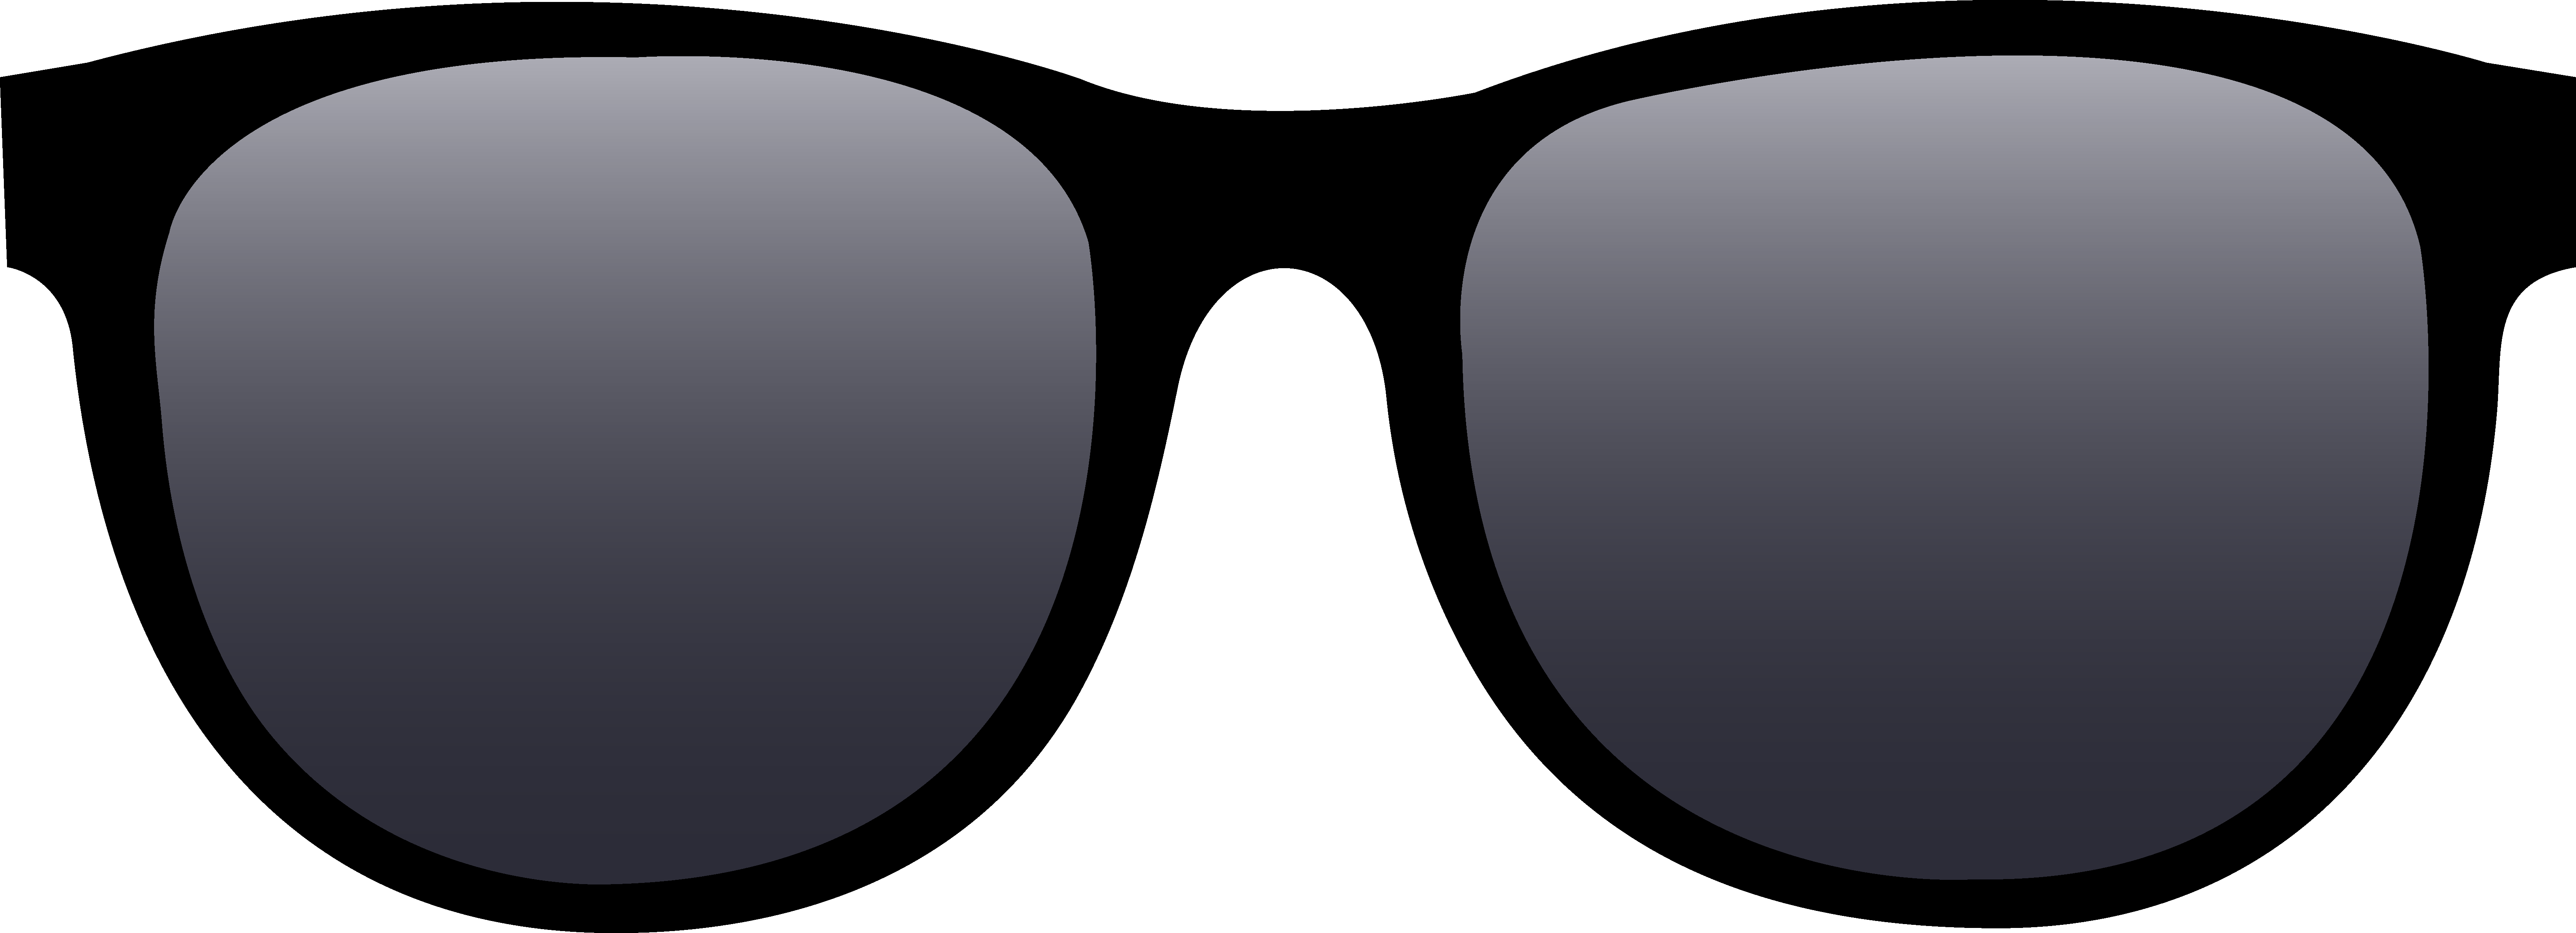 Sun Glasses PNG Image